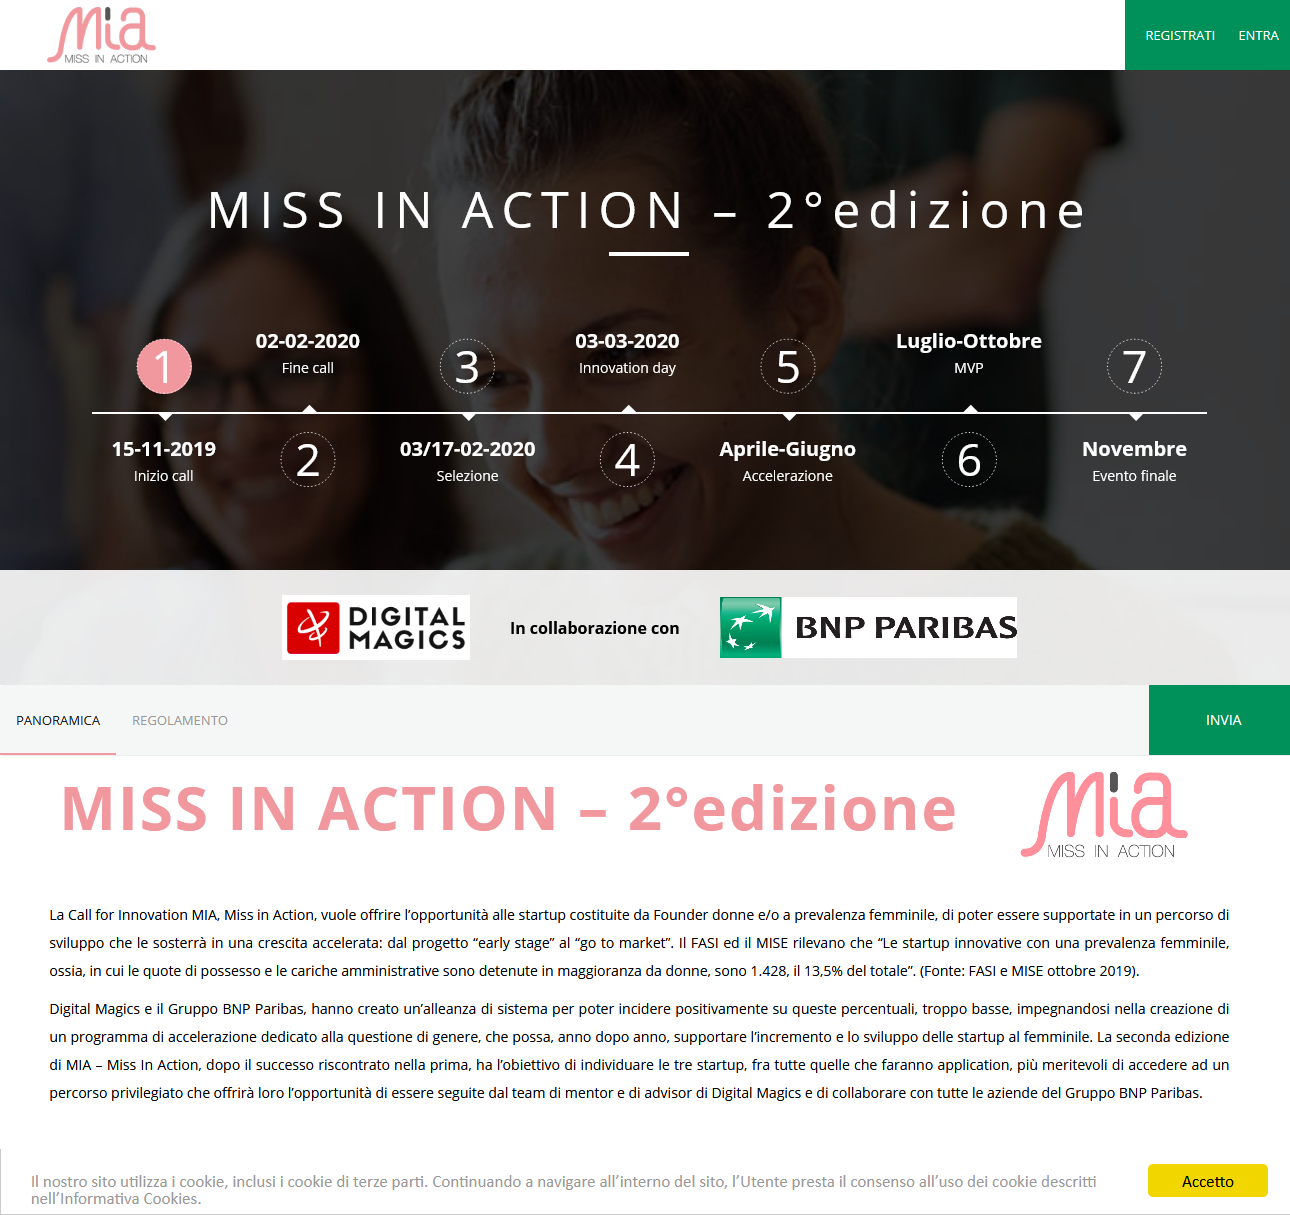 MISS IN ACTION – 2°edizione